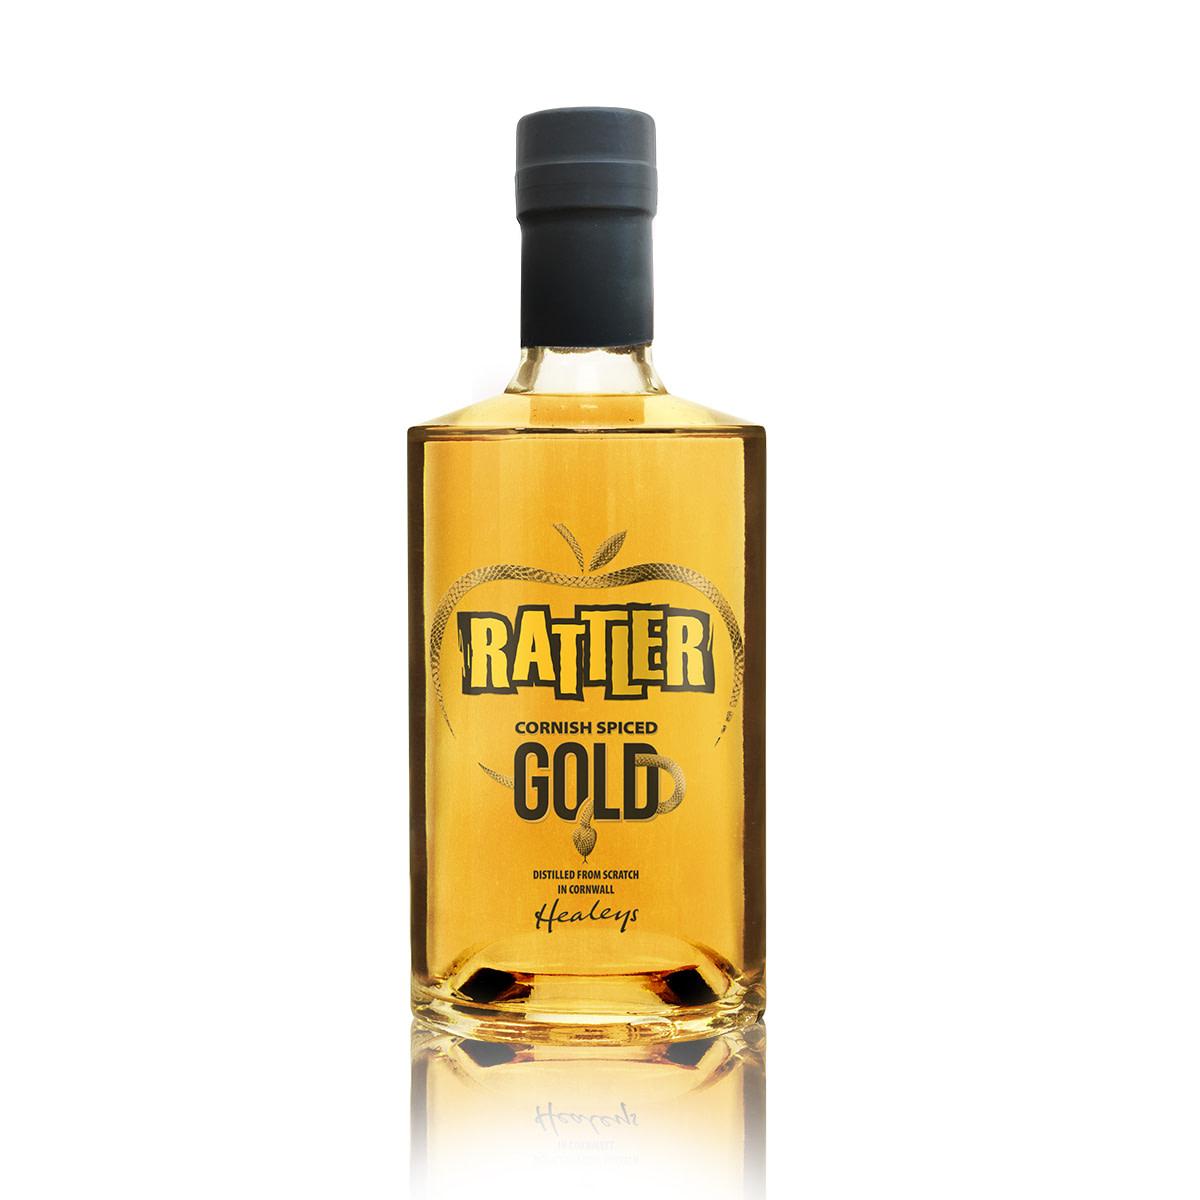 Rattler Spiced Gold